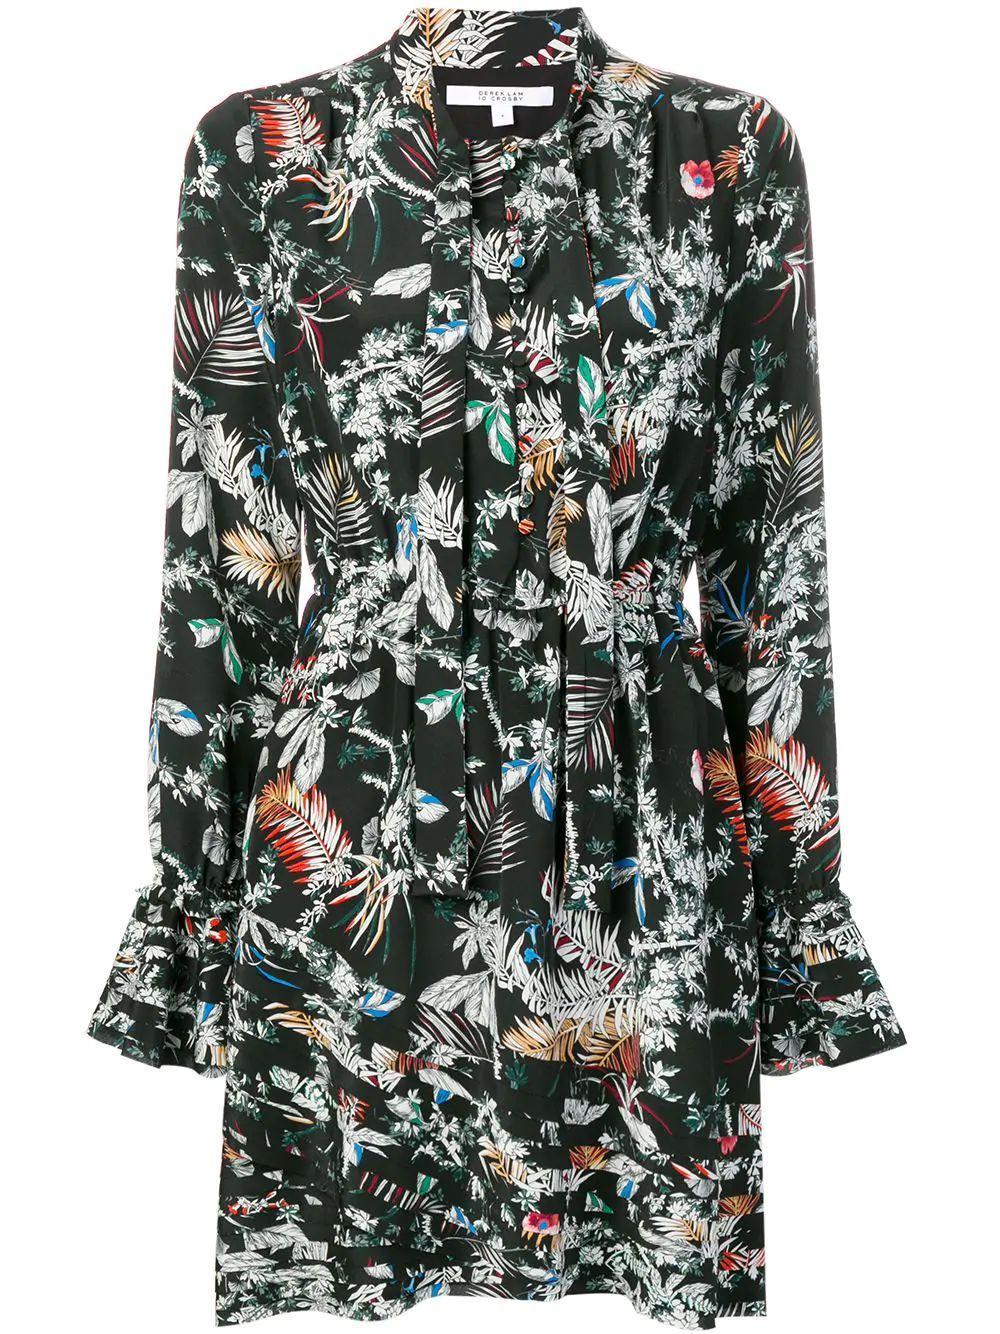 Long Sleeve Ruffle Hem Dress With Button Detail Item # TF91511WF